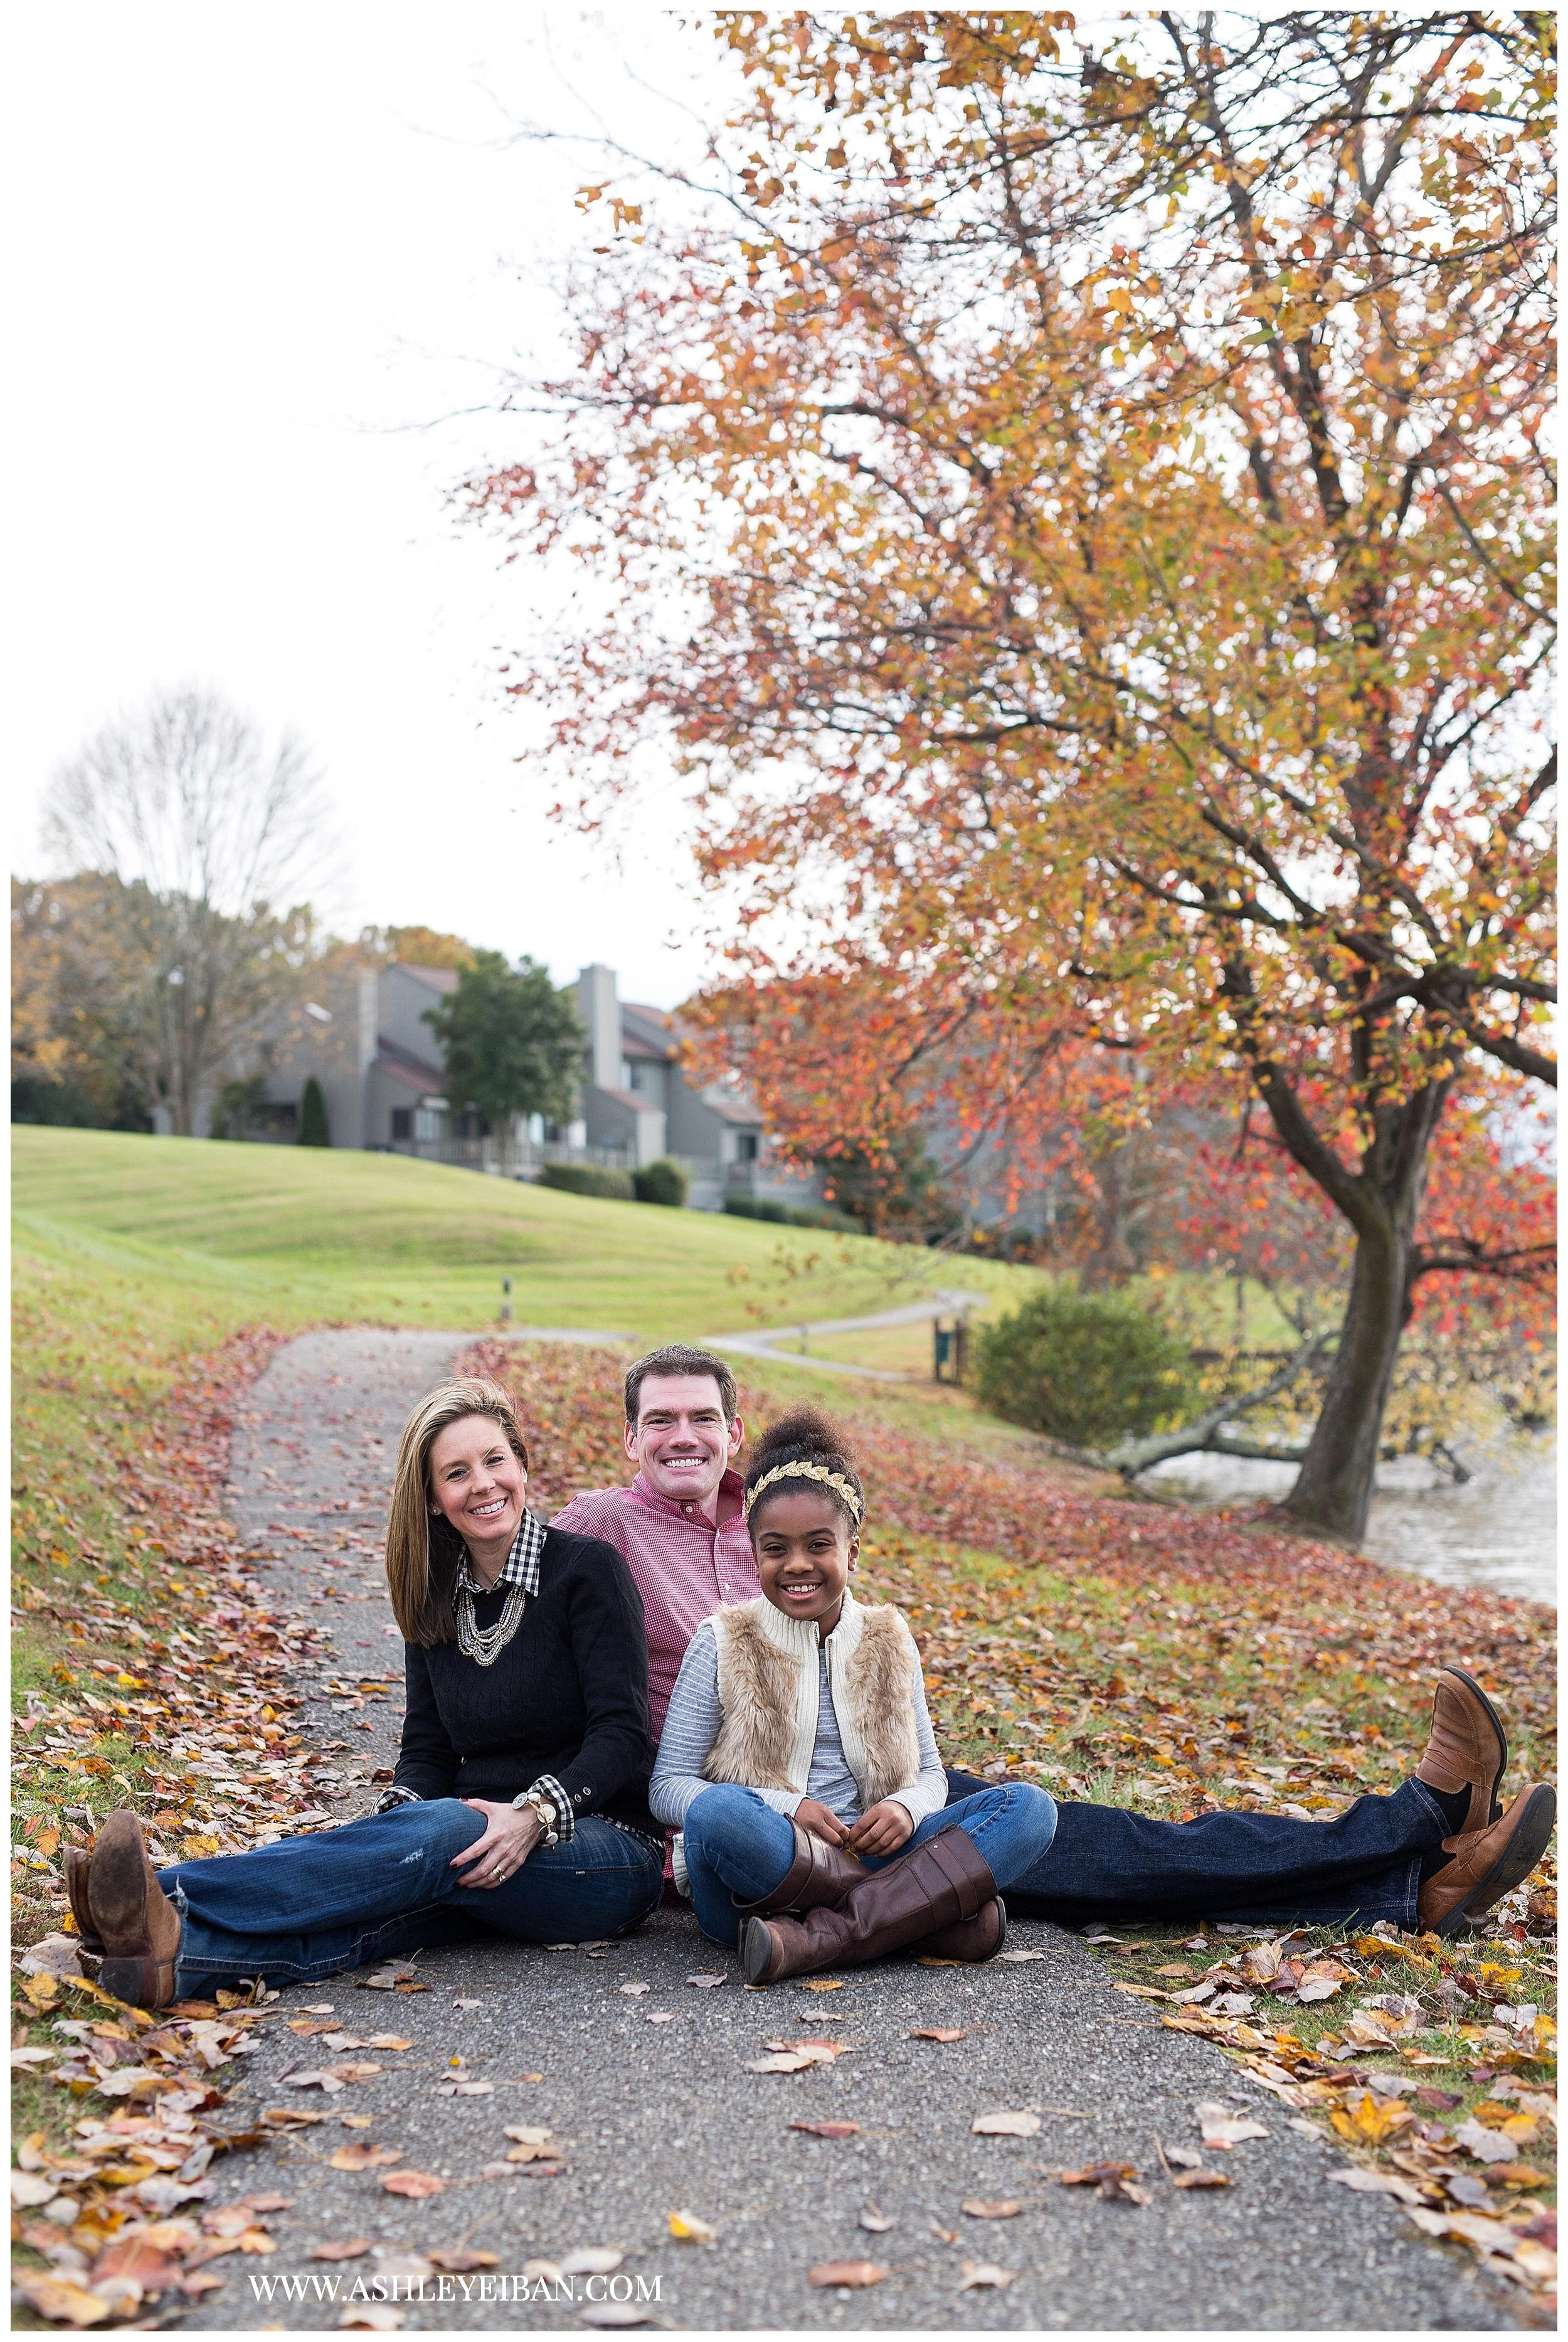 Lynchburg Virginia Family Photographer || Central VA Photographer || Ashley Eiban Photography || www.ashleyeiban.com